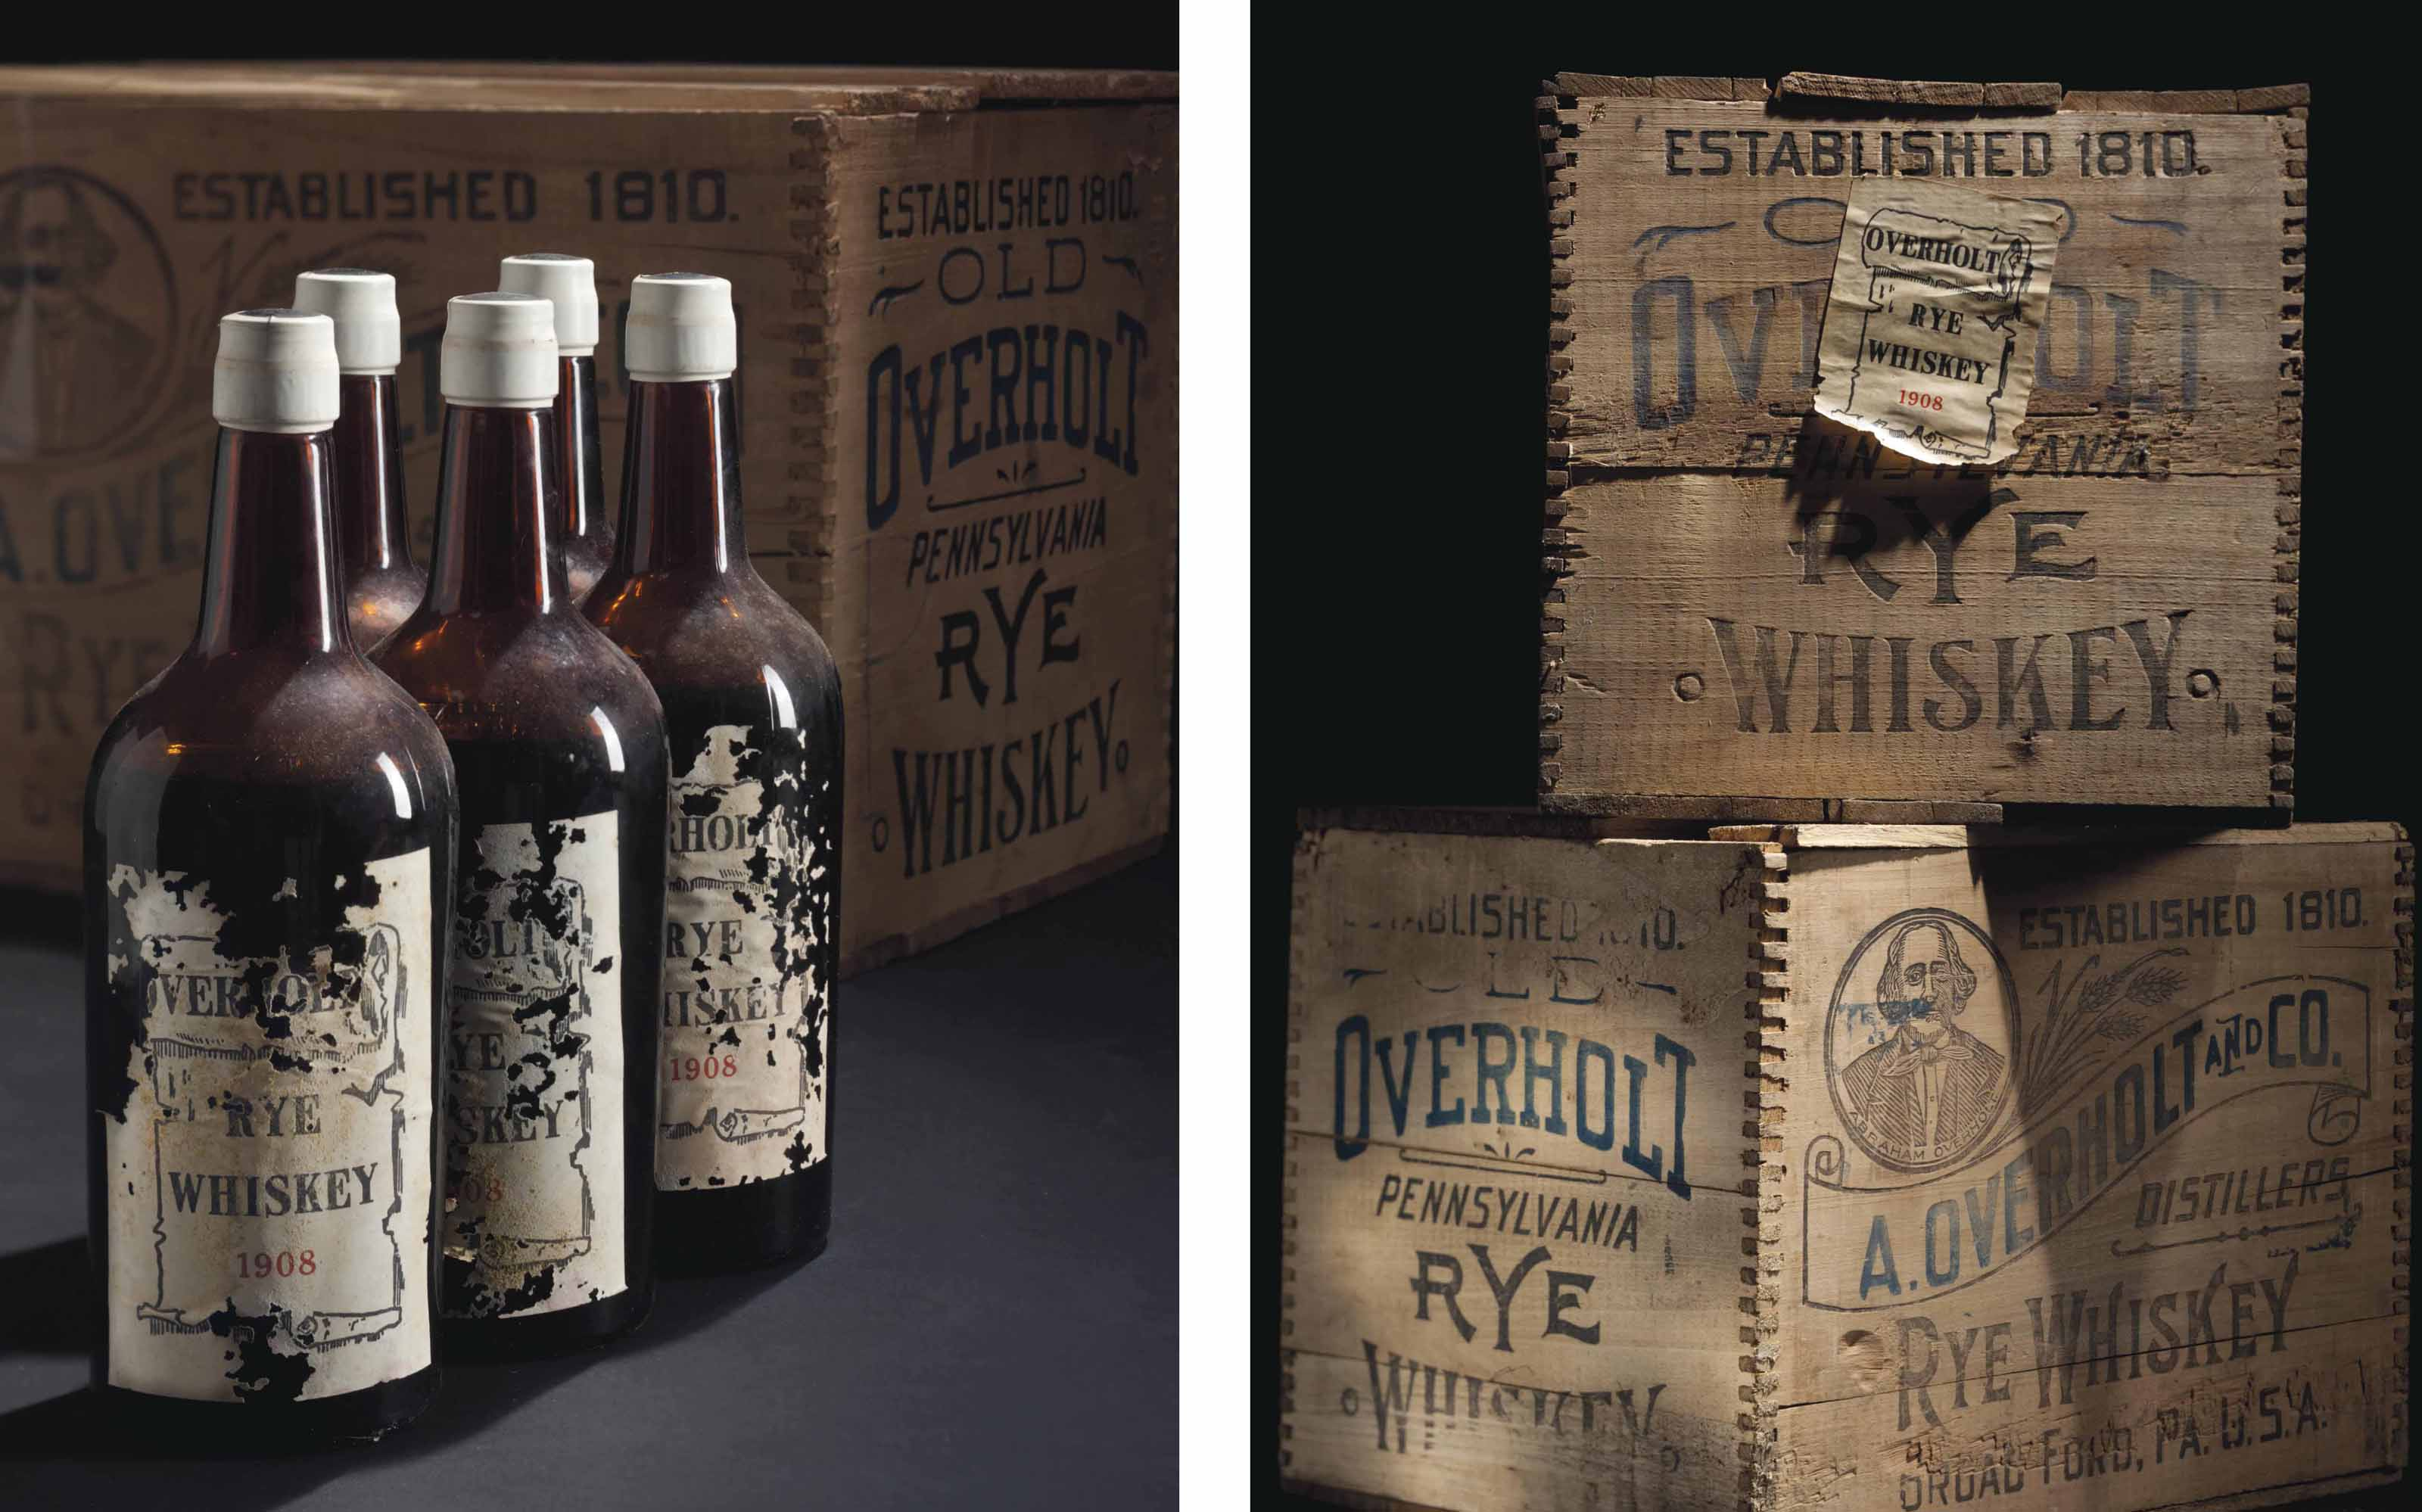 Overholt, Rye Whiskey 1912